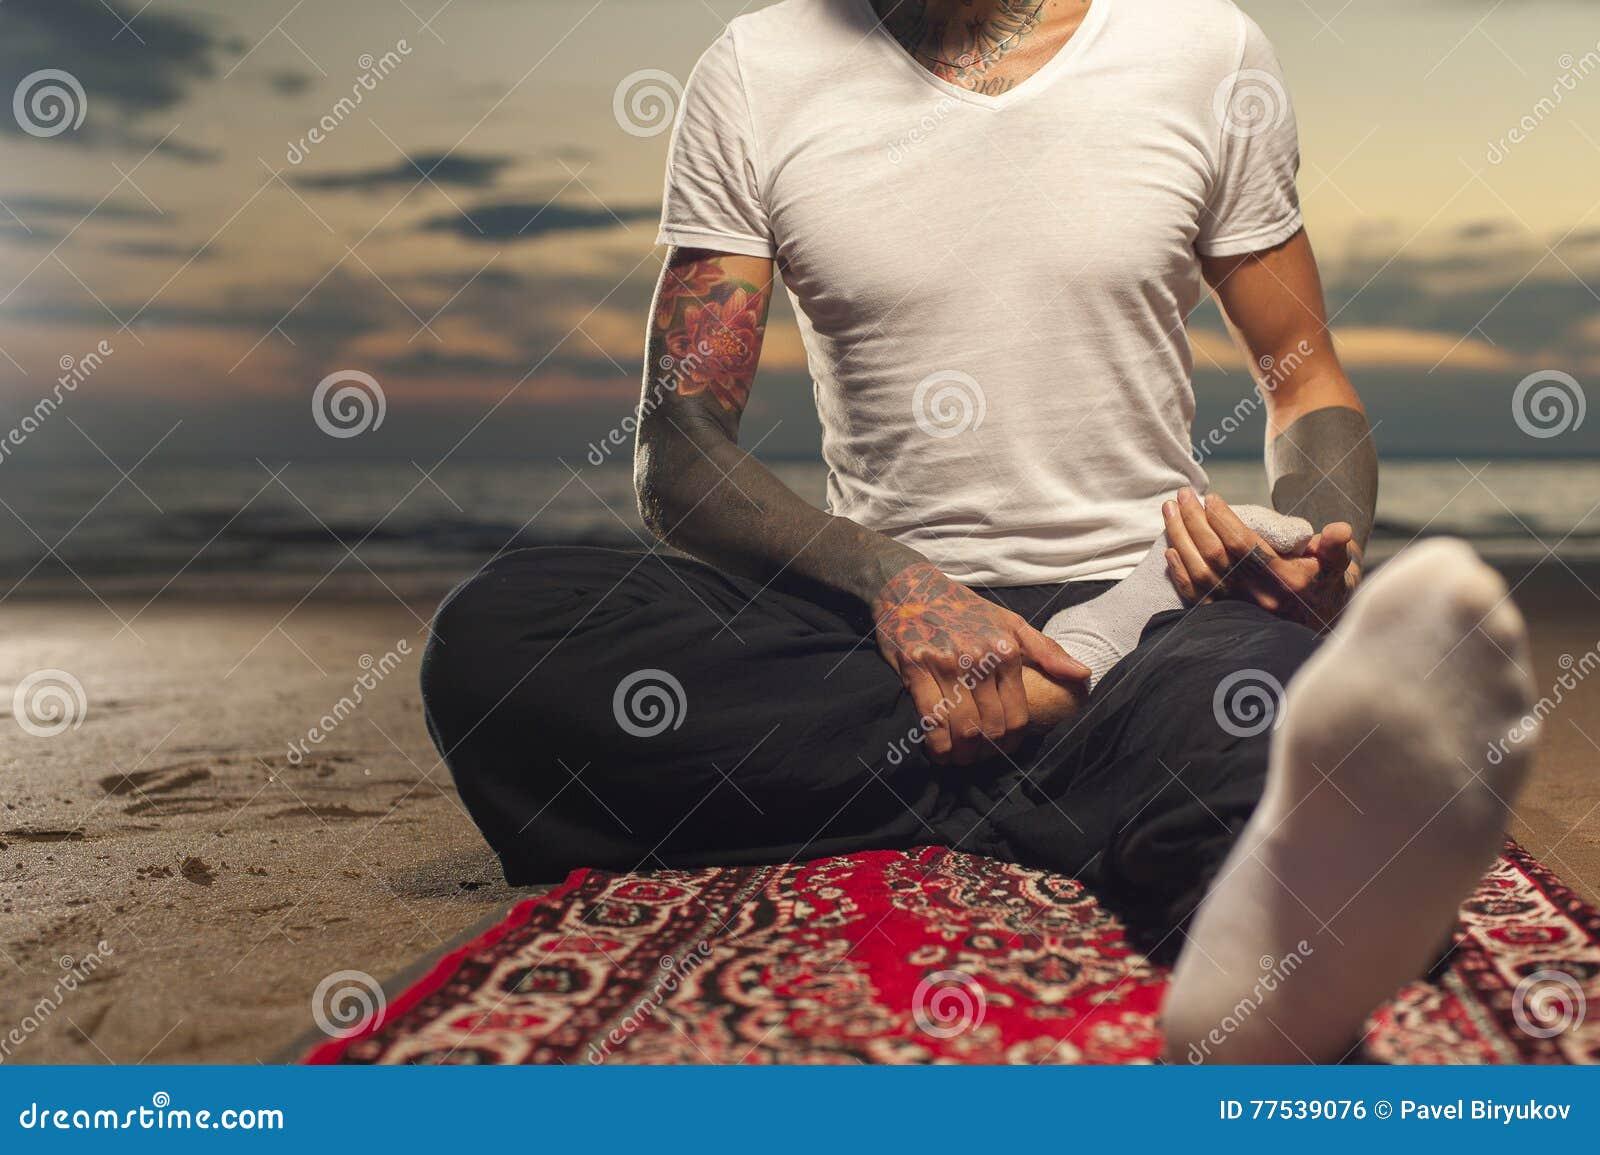 Flexible Man With Tattoo Doing Yoga Lotus Pose Stock Photo Image